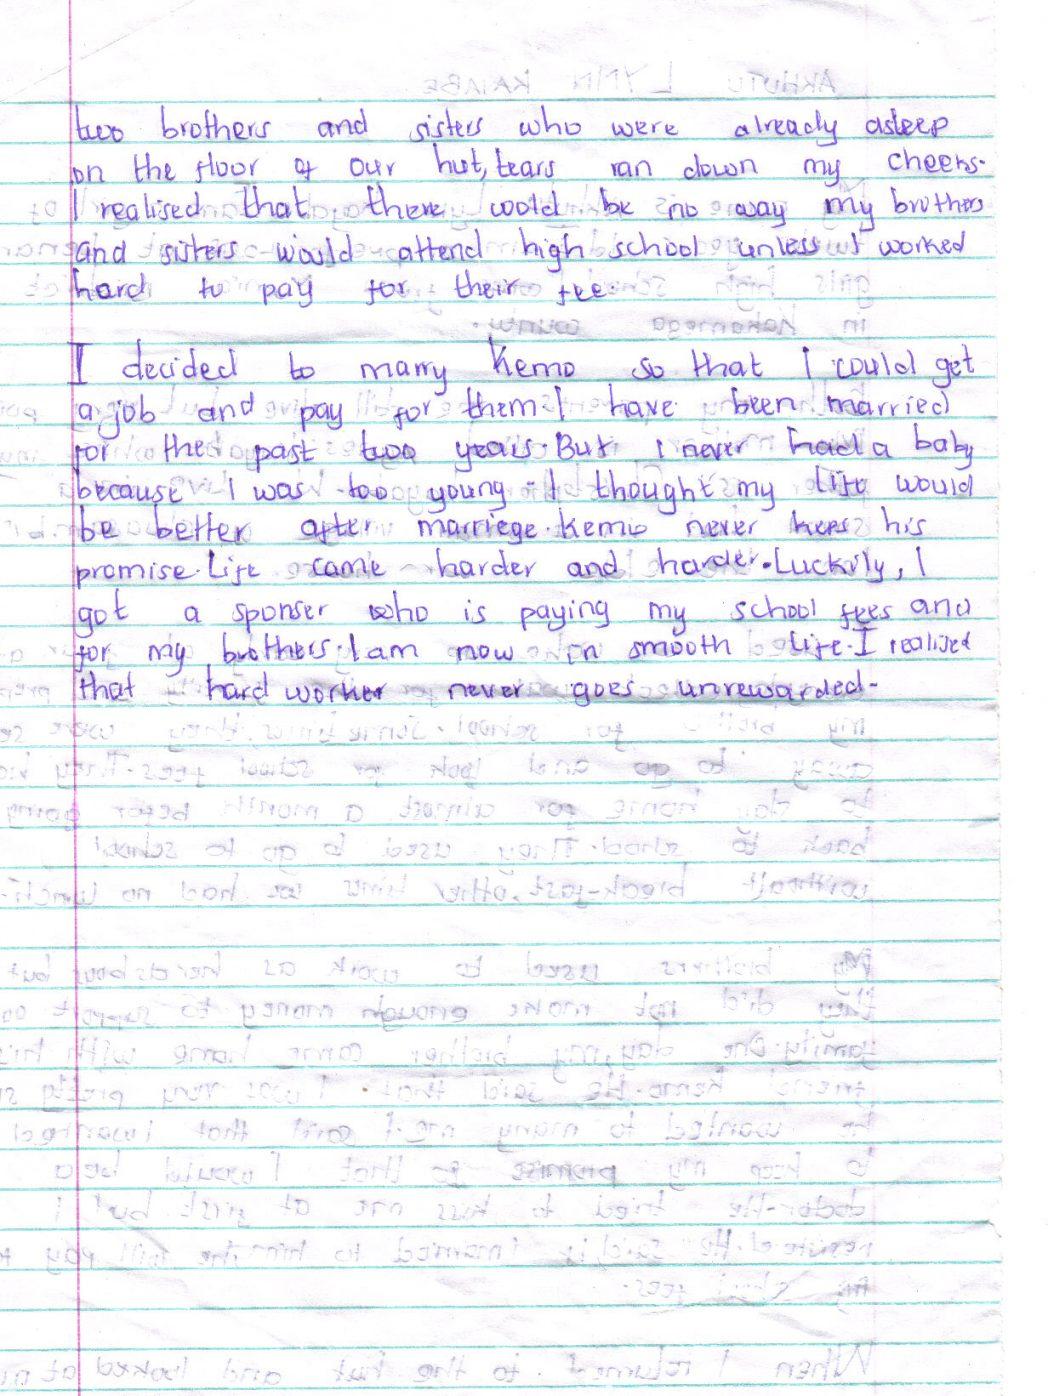 011 Hard Work Essay Essays On Gxart Sample Akhutu Lynn Kayabe First Writing Comp Pg2 Second Place Unused Au For Service Social 1048x1396 Wonderful In Urdu Example Full